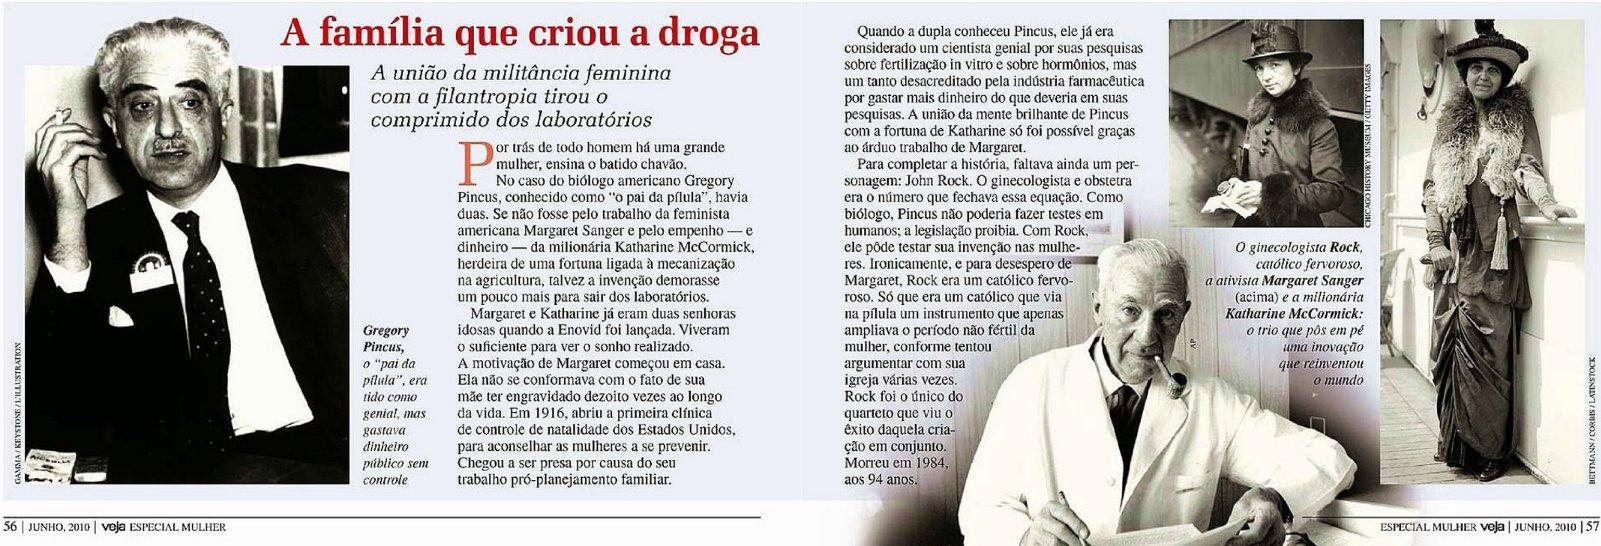 John Rock - Gregory Goodwin Pincus